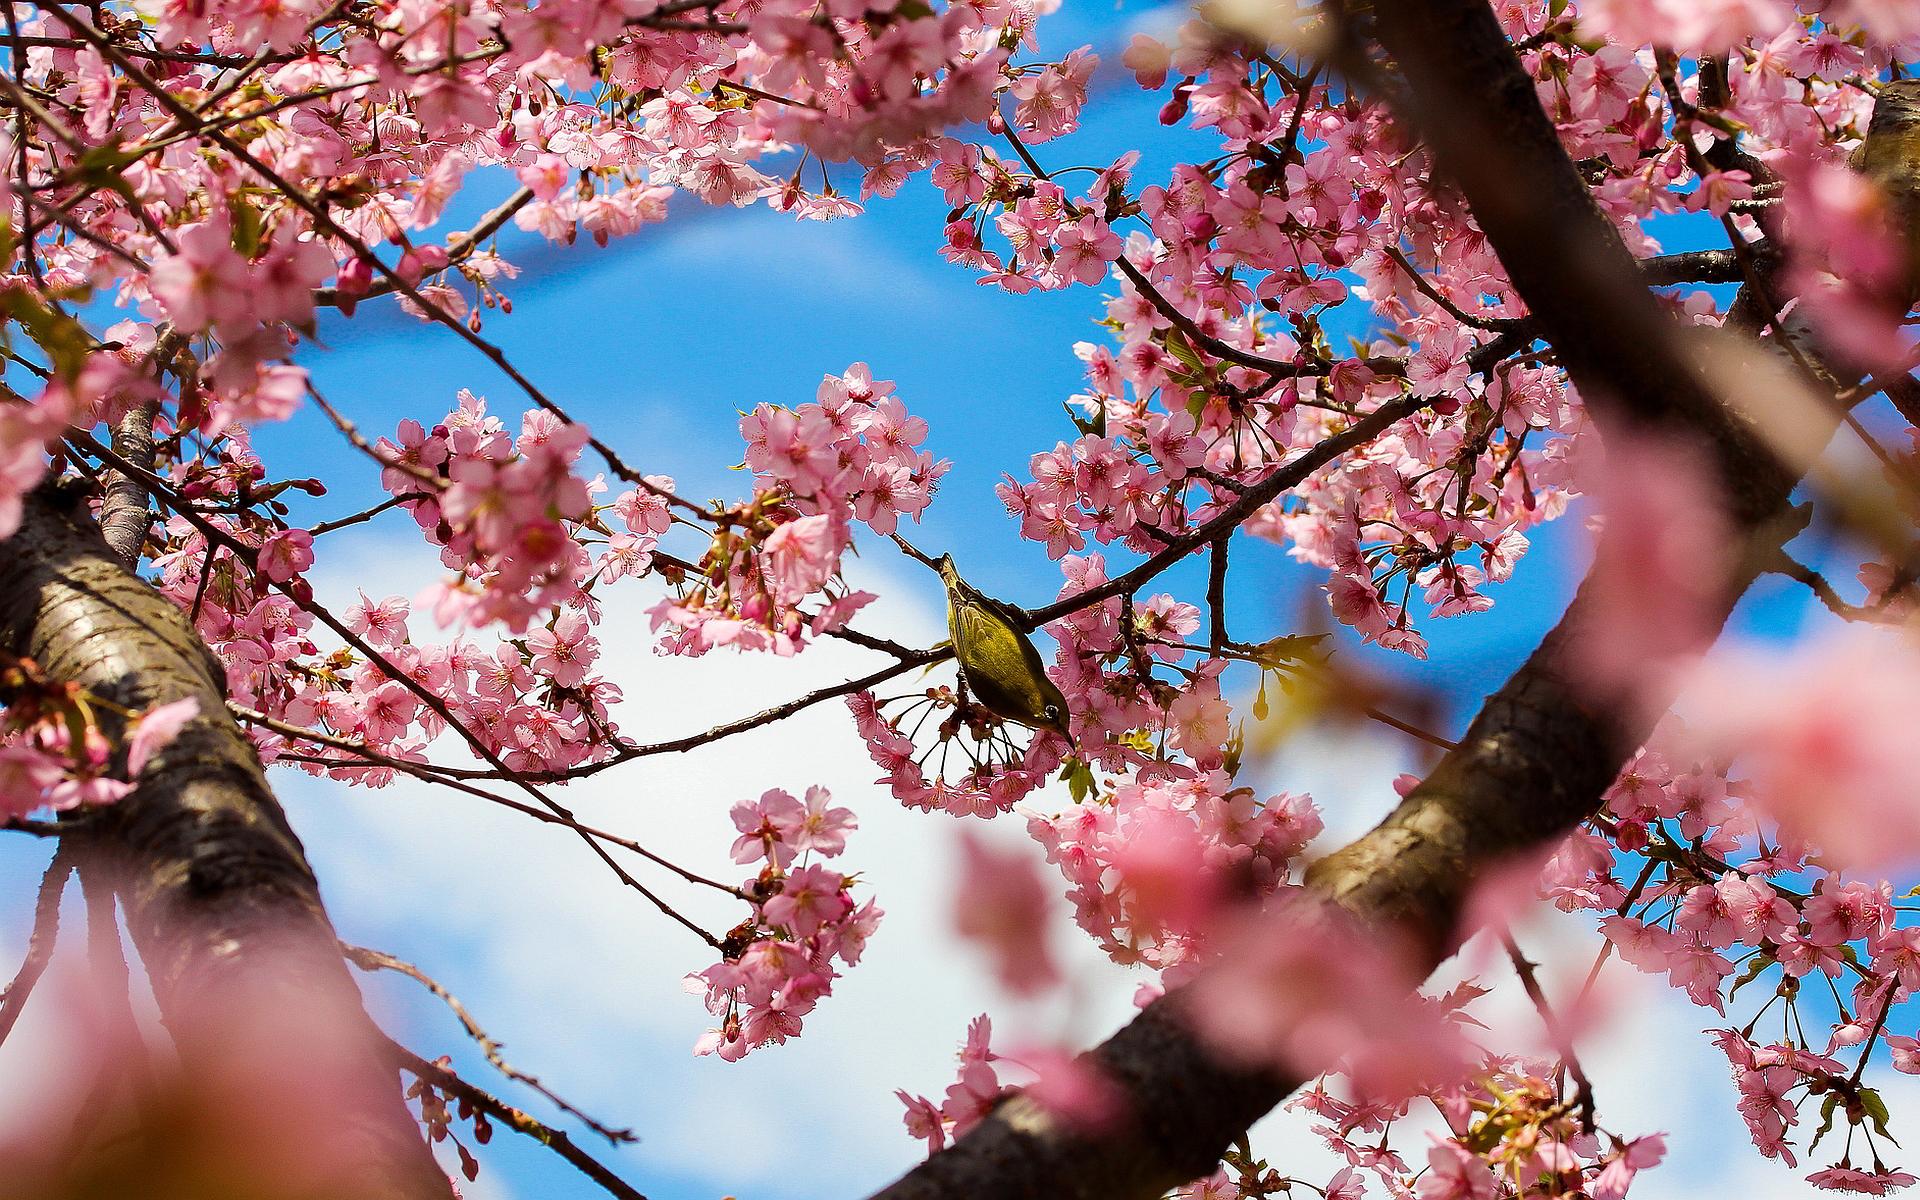 3d Blossoms Live Wallpaper Free Spring Desktop Wallpapers Backgrounds Hd Desktop